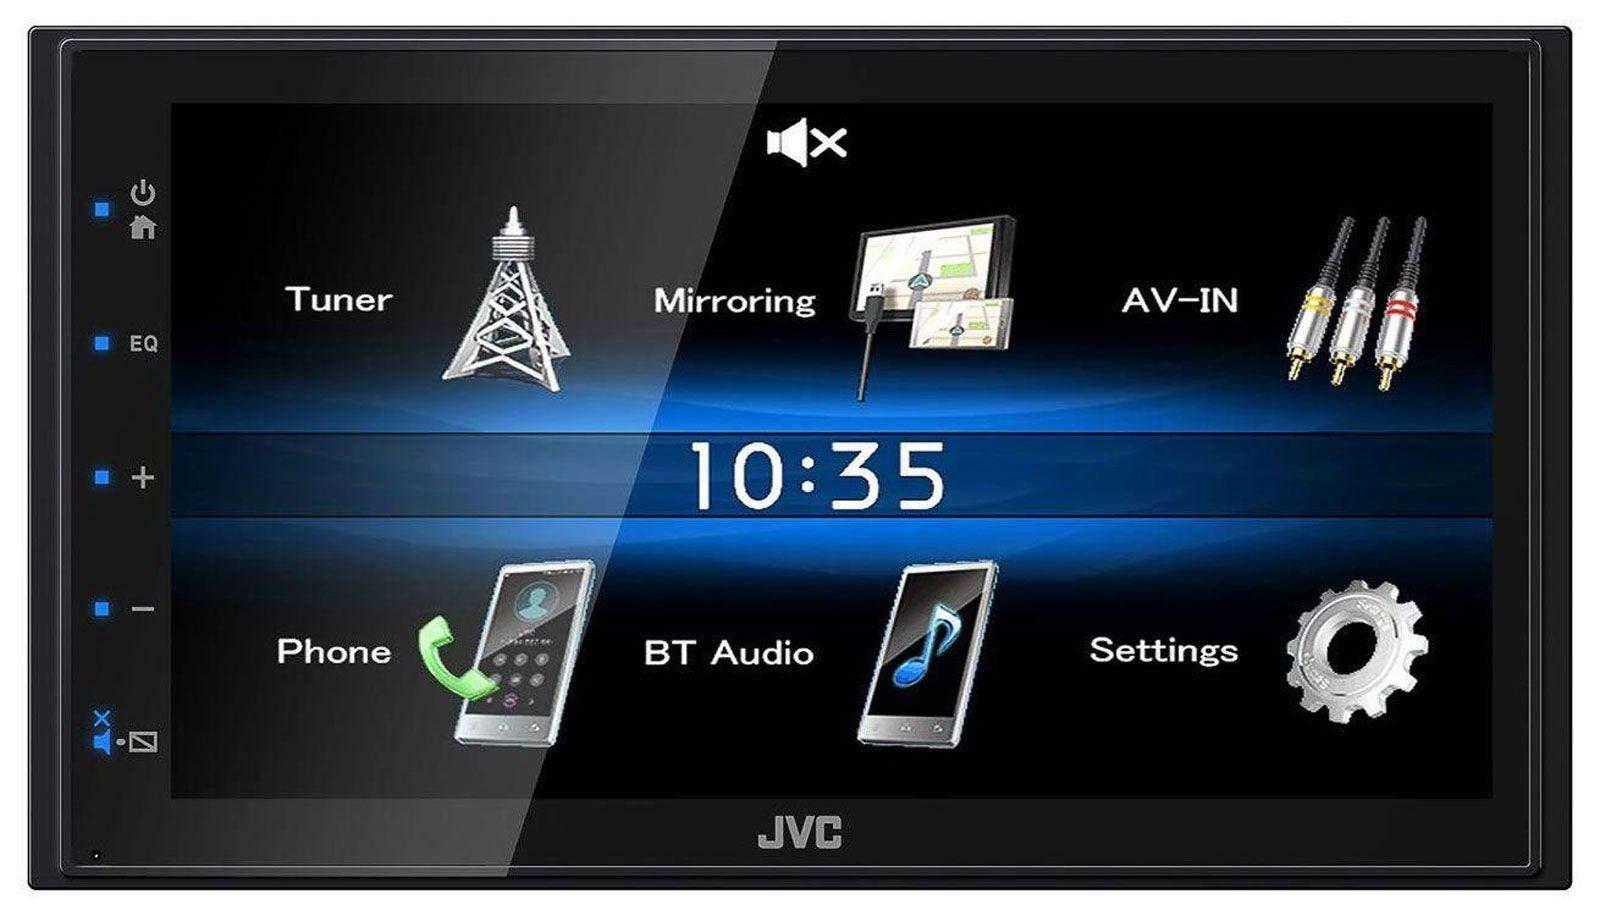 JVC-KW-M25BT-USB-2DIN-Bluetooth-MP3-AUX-Autoradio-fr-Audi-A4-B5-99-01-Symphony-Bose-Aktivsystem